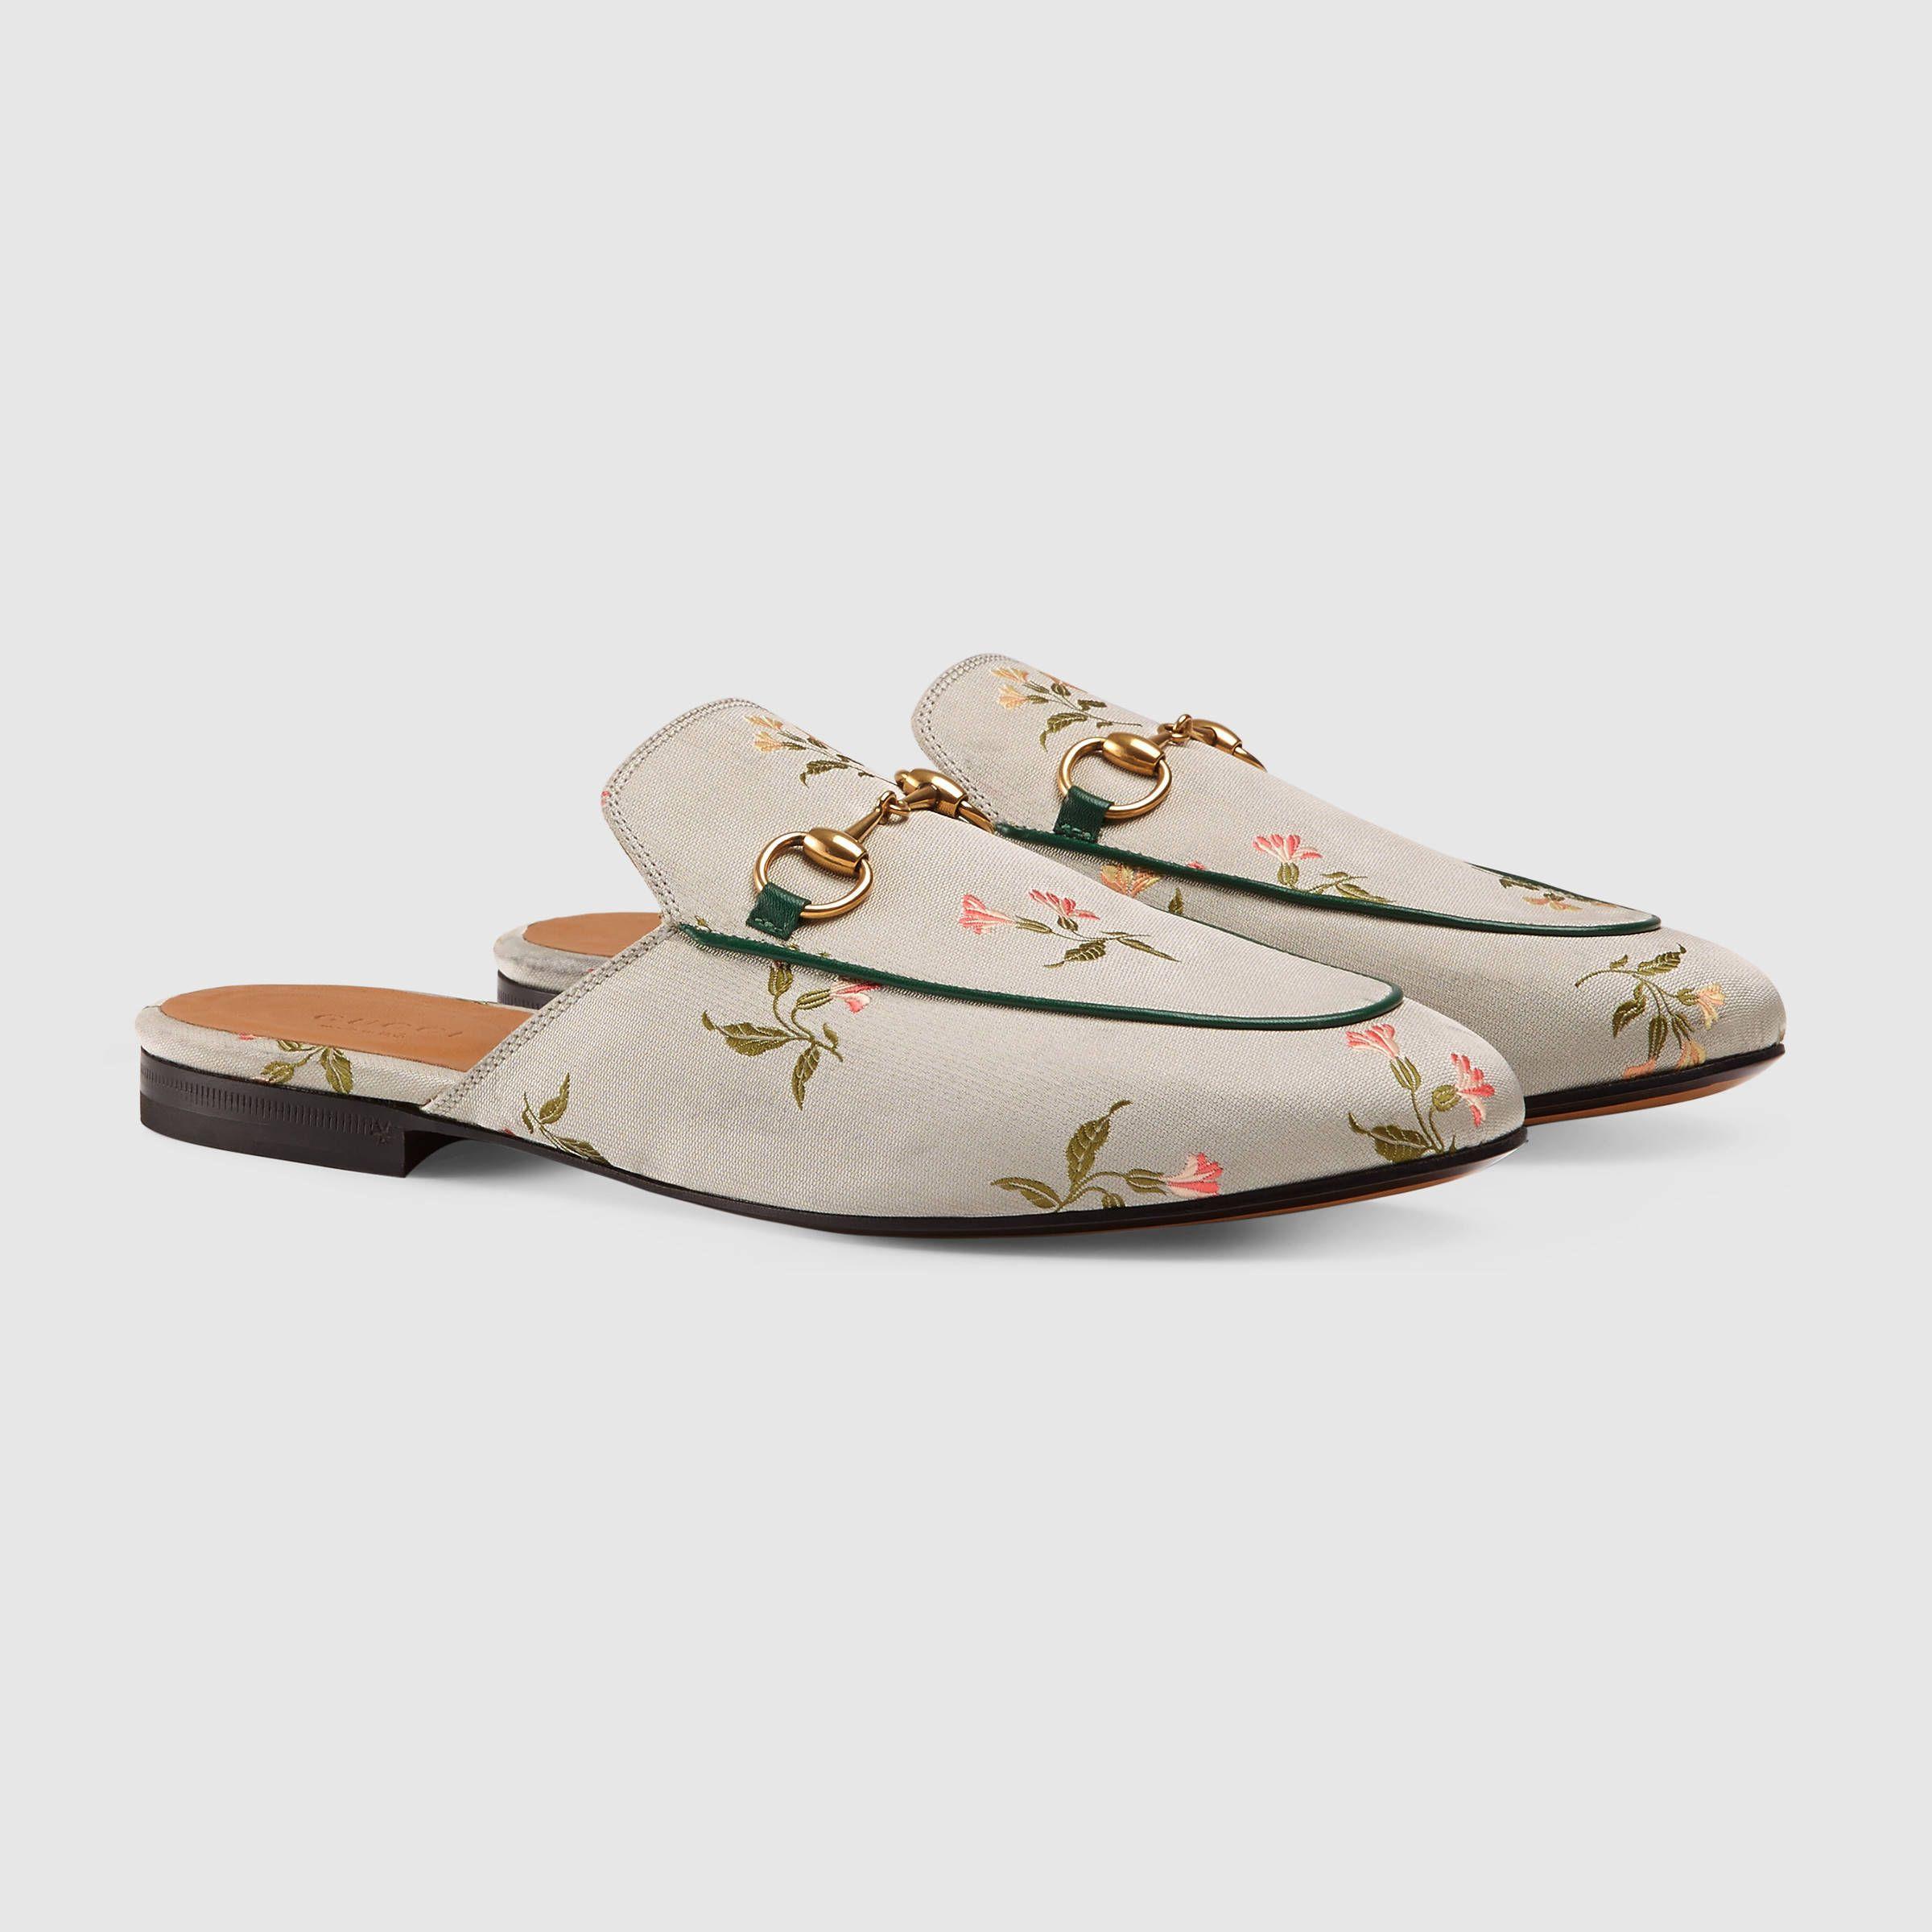 d014eceabe81 Princetown floral duchesse slipper | ***GUCCI FASHION*** | Slippers ...